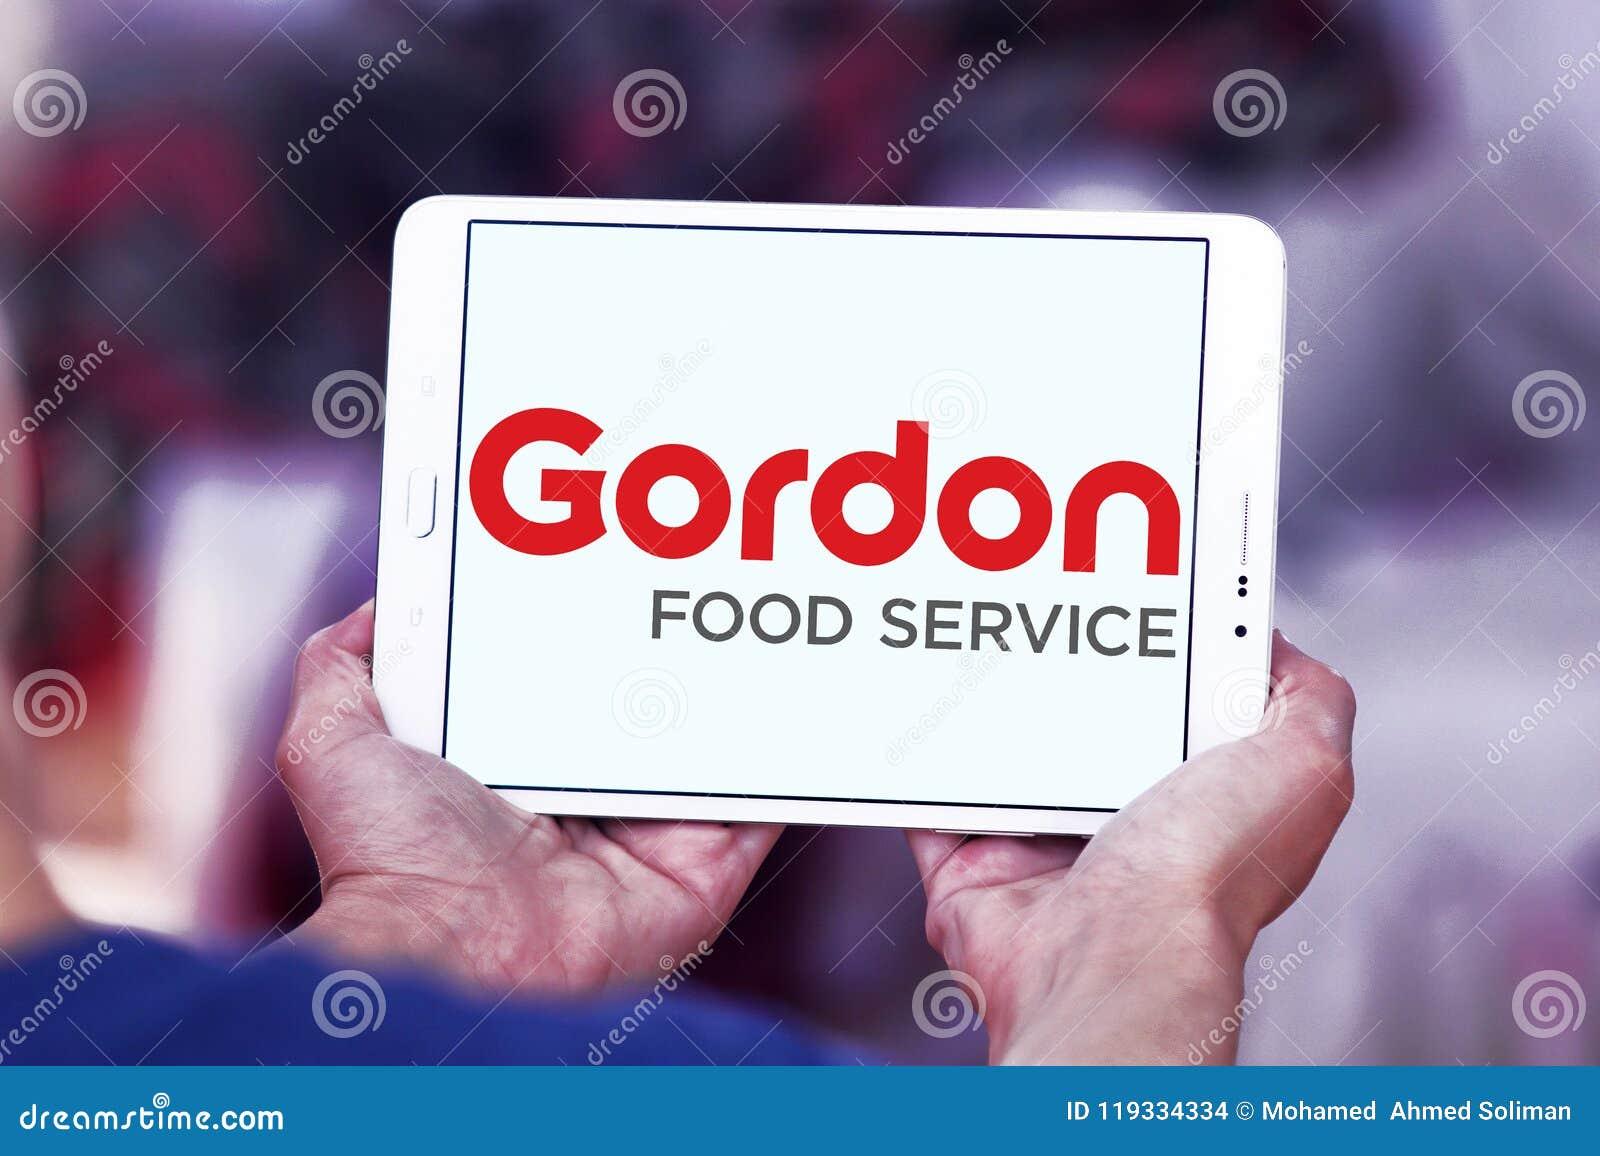 Gordon Food Service logo editorial stock image  Image of logotype